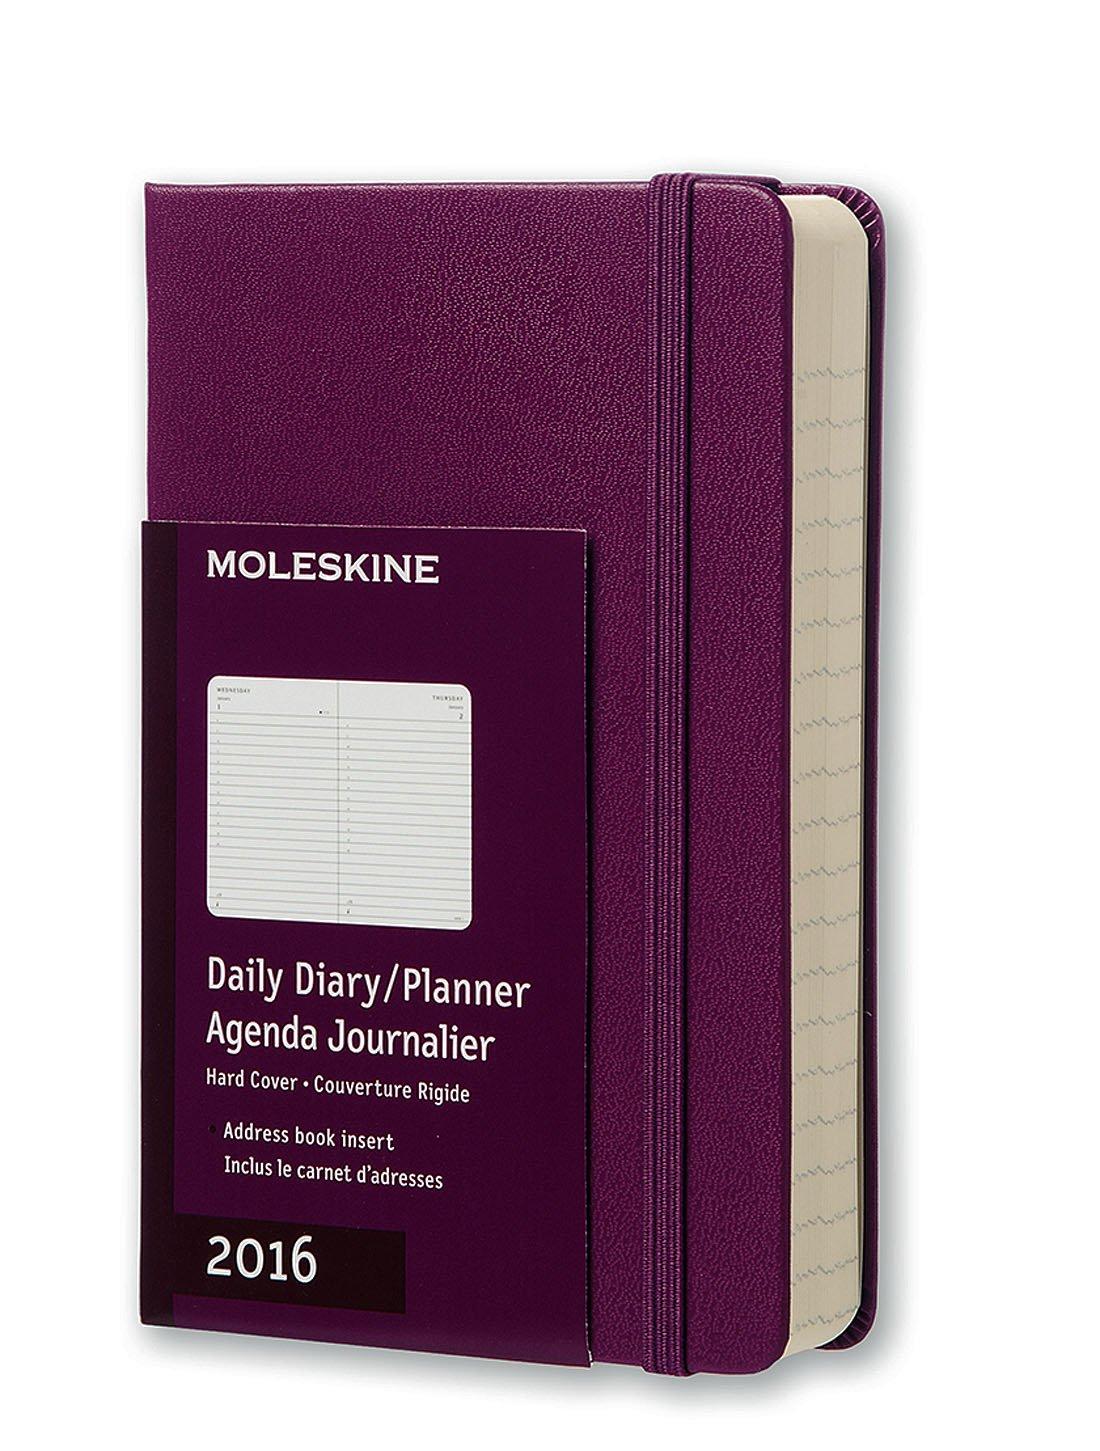 Amazon.com: Moleskine 2016 Daily Planner, 12M, Pocket, Mauve ...